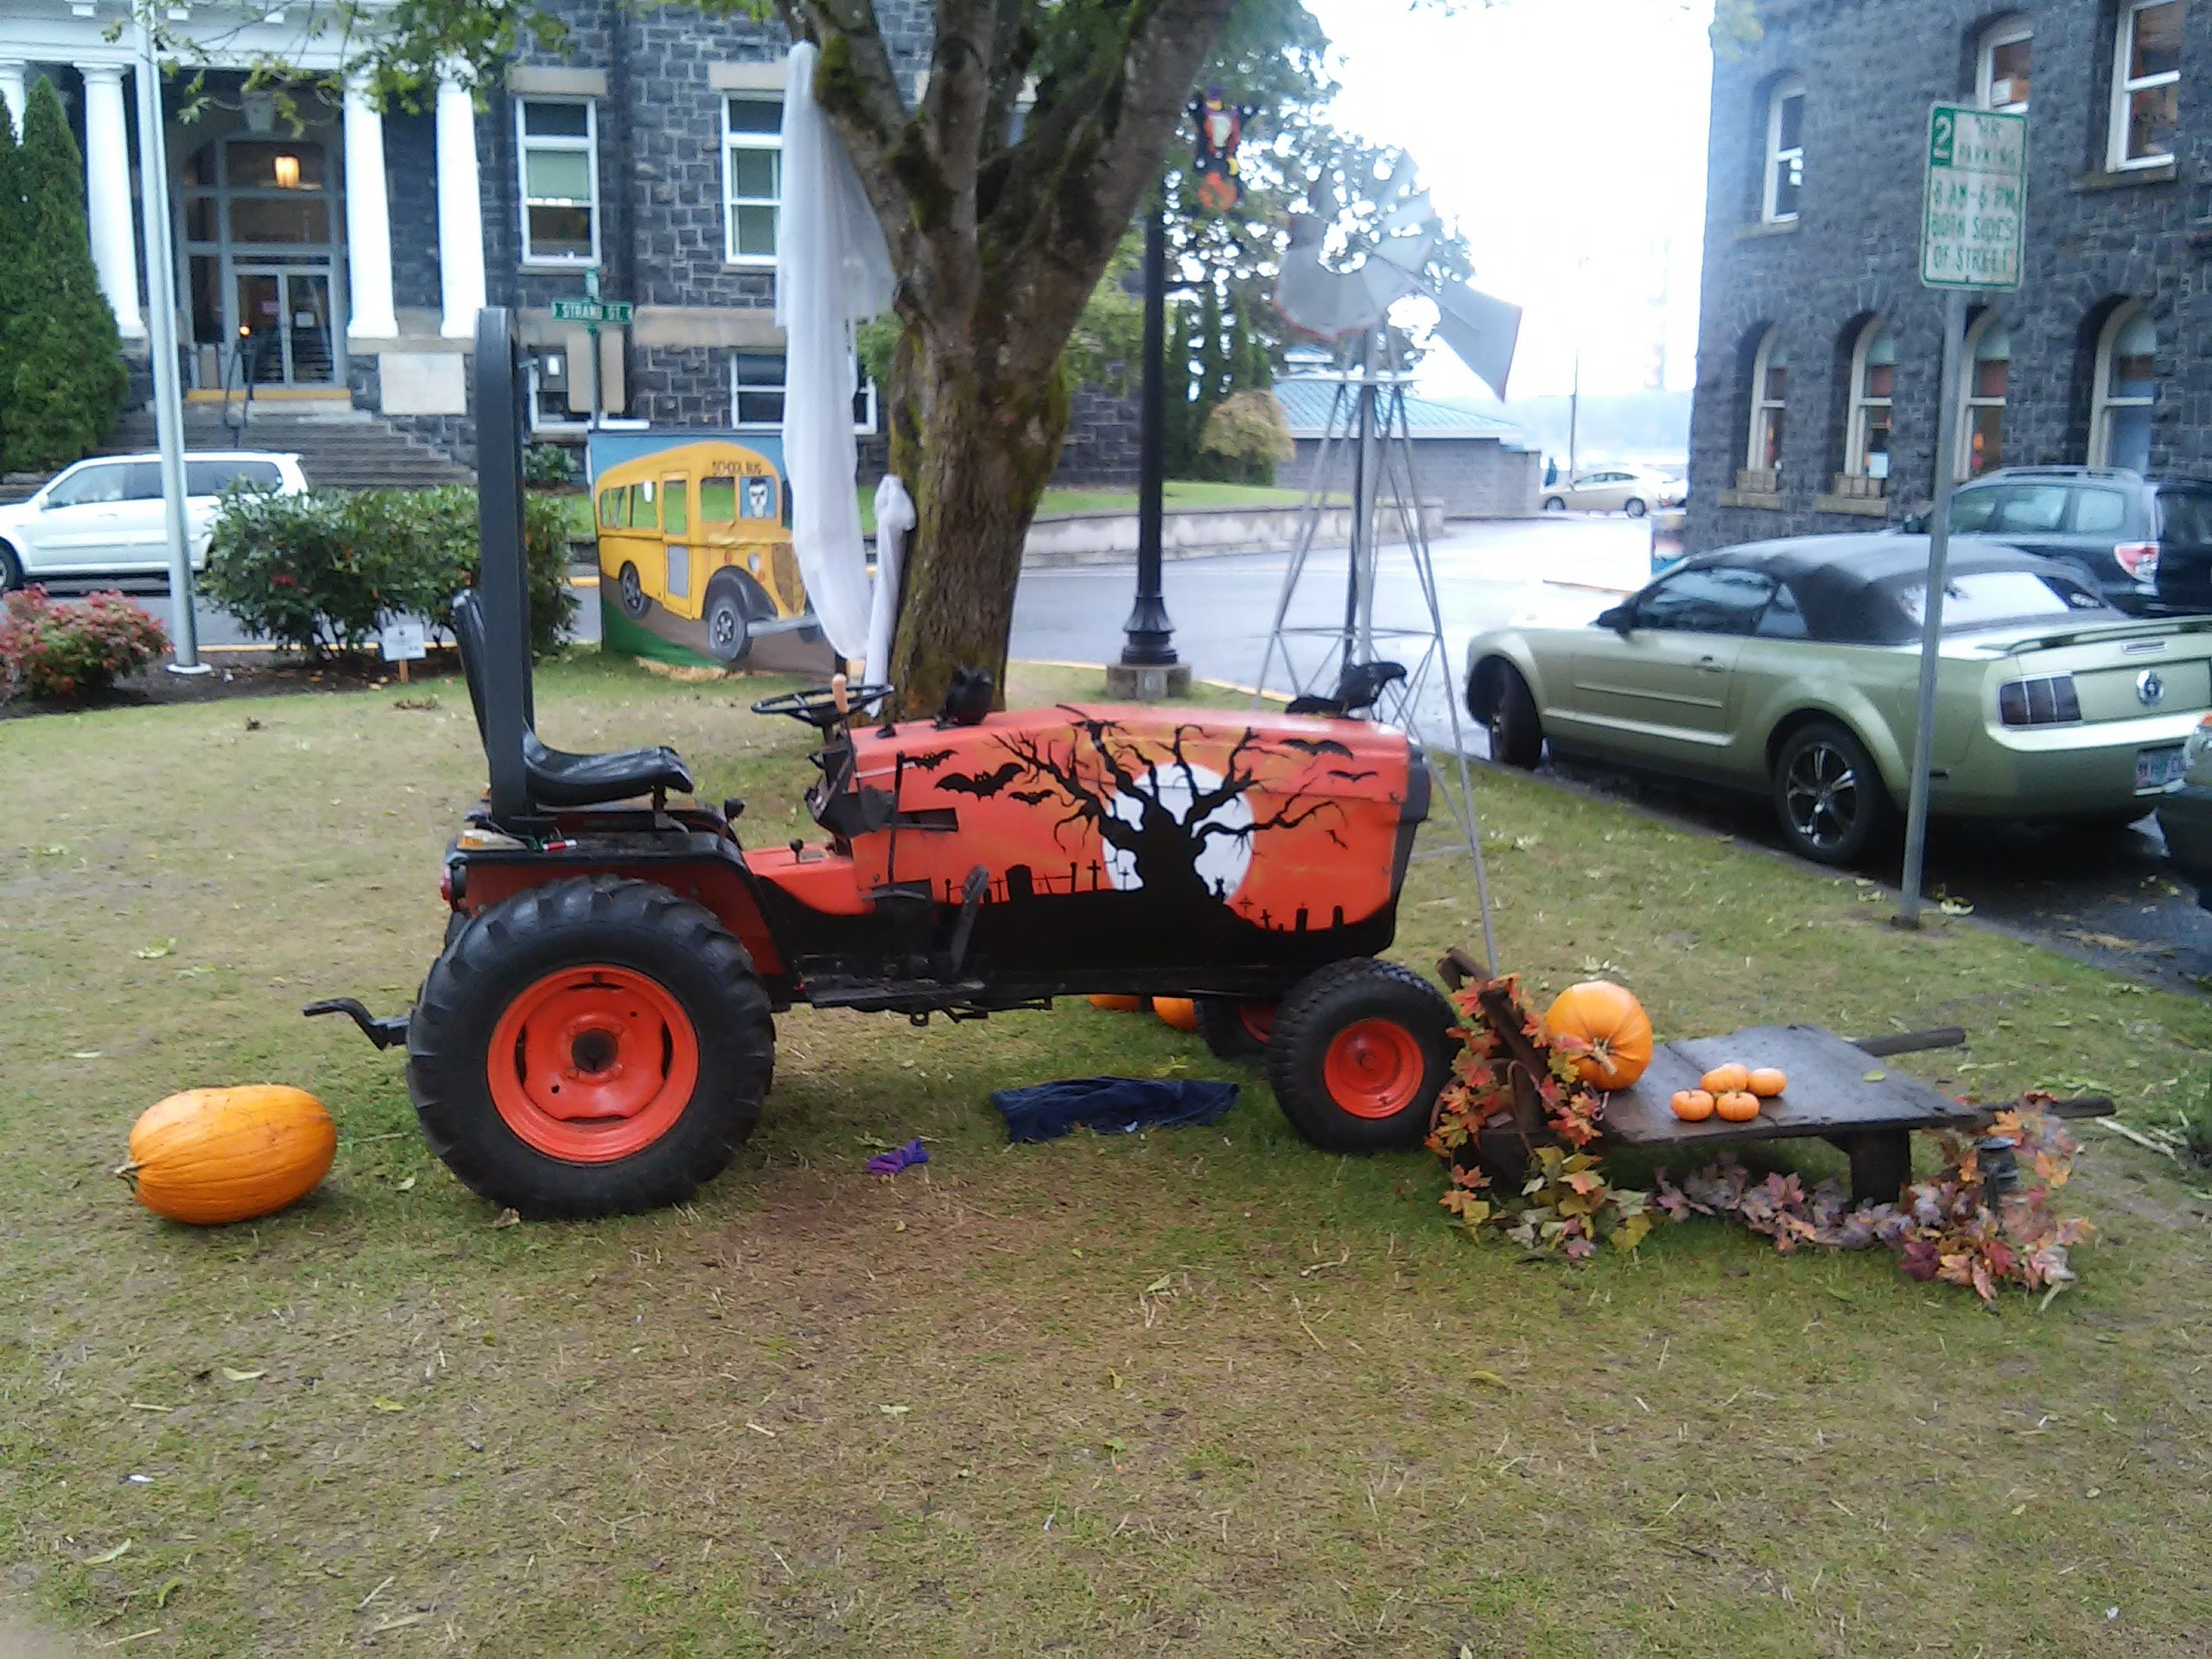 SAINT HELENS OR HALLOWEEN TOWN 2015 Halloween town